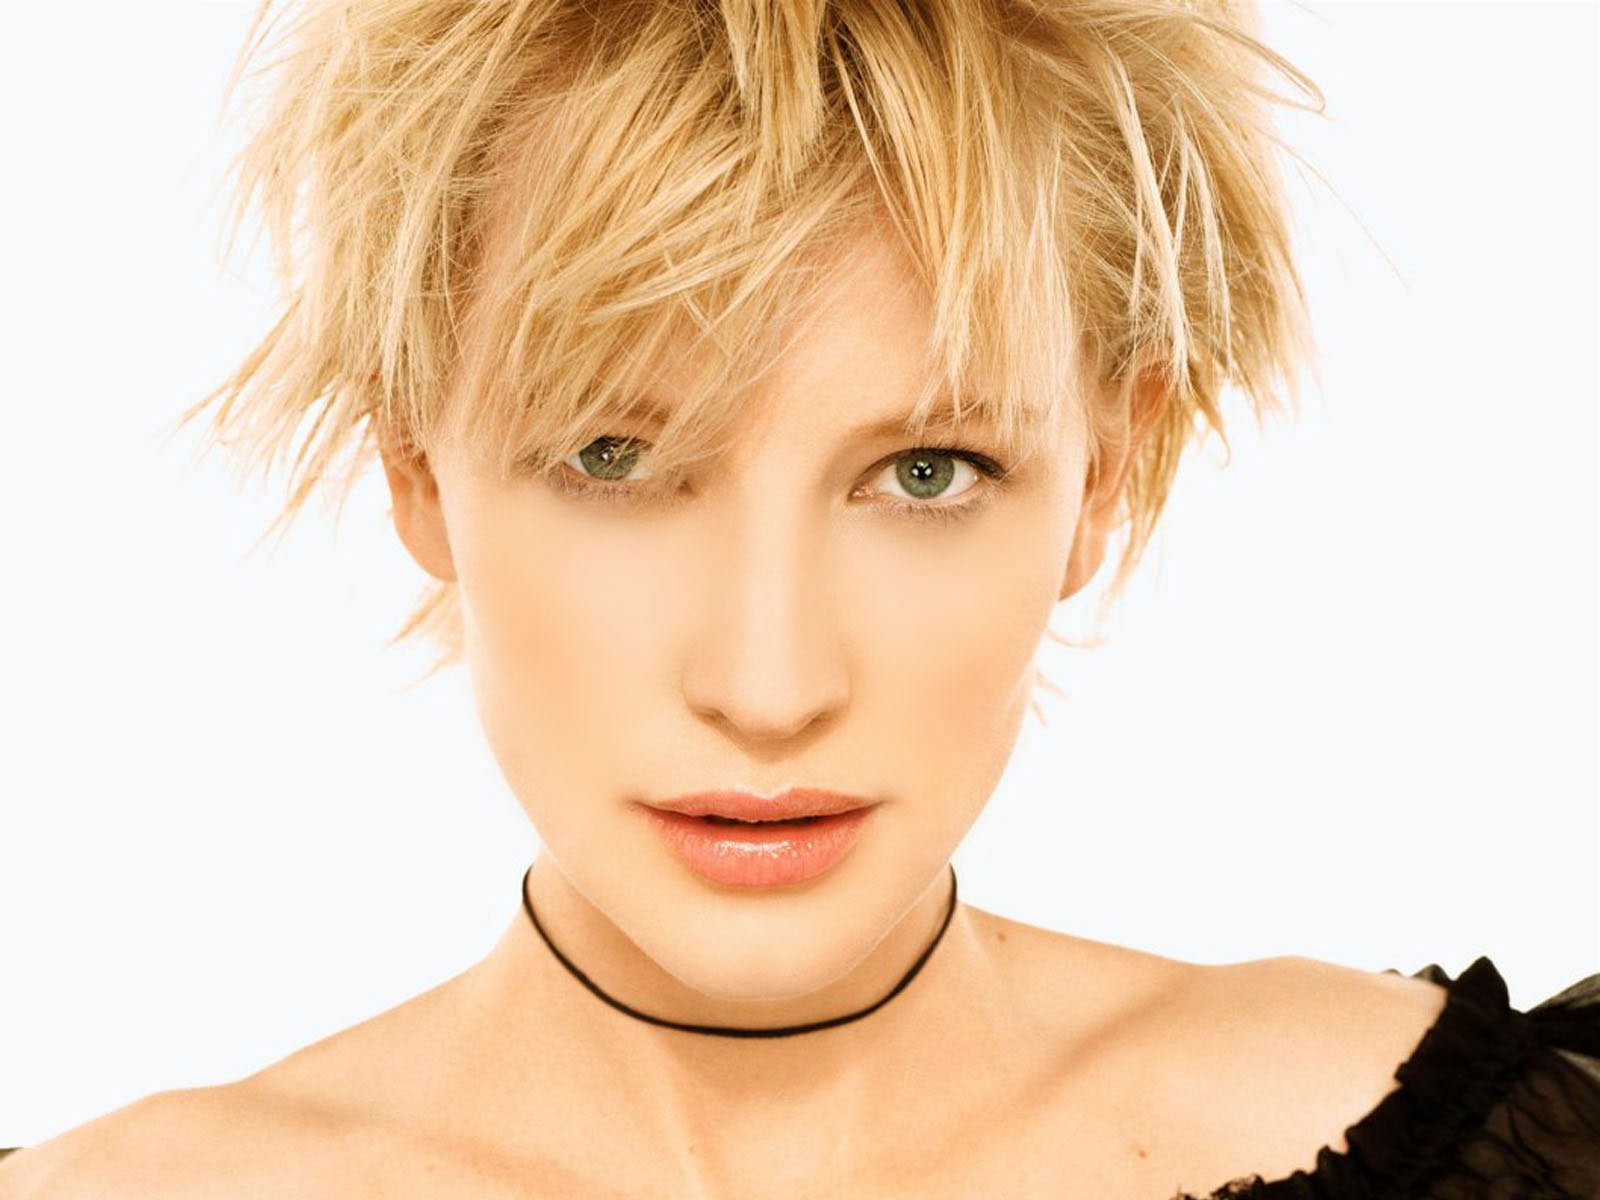 Cate Blanchett High Res Wallpaper